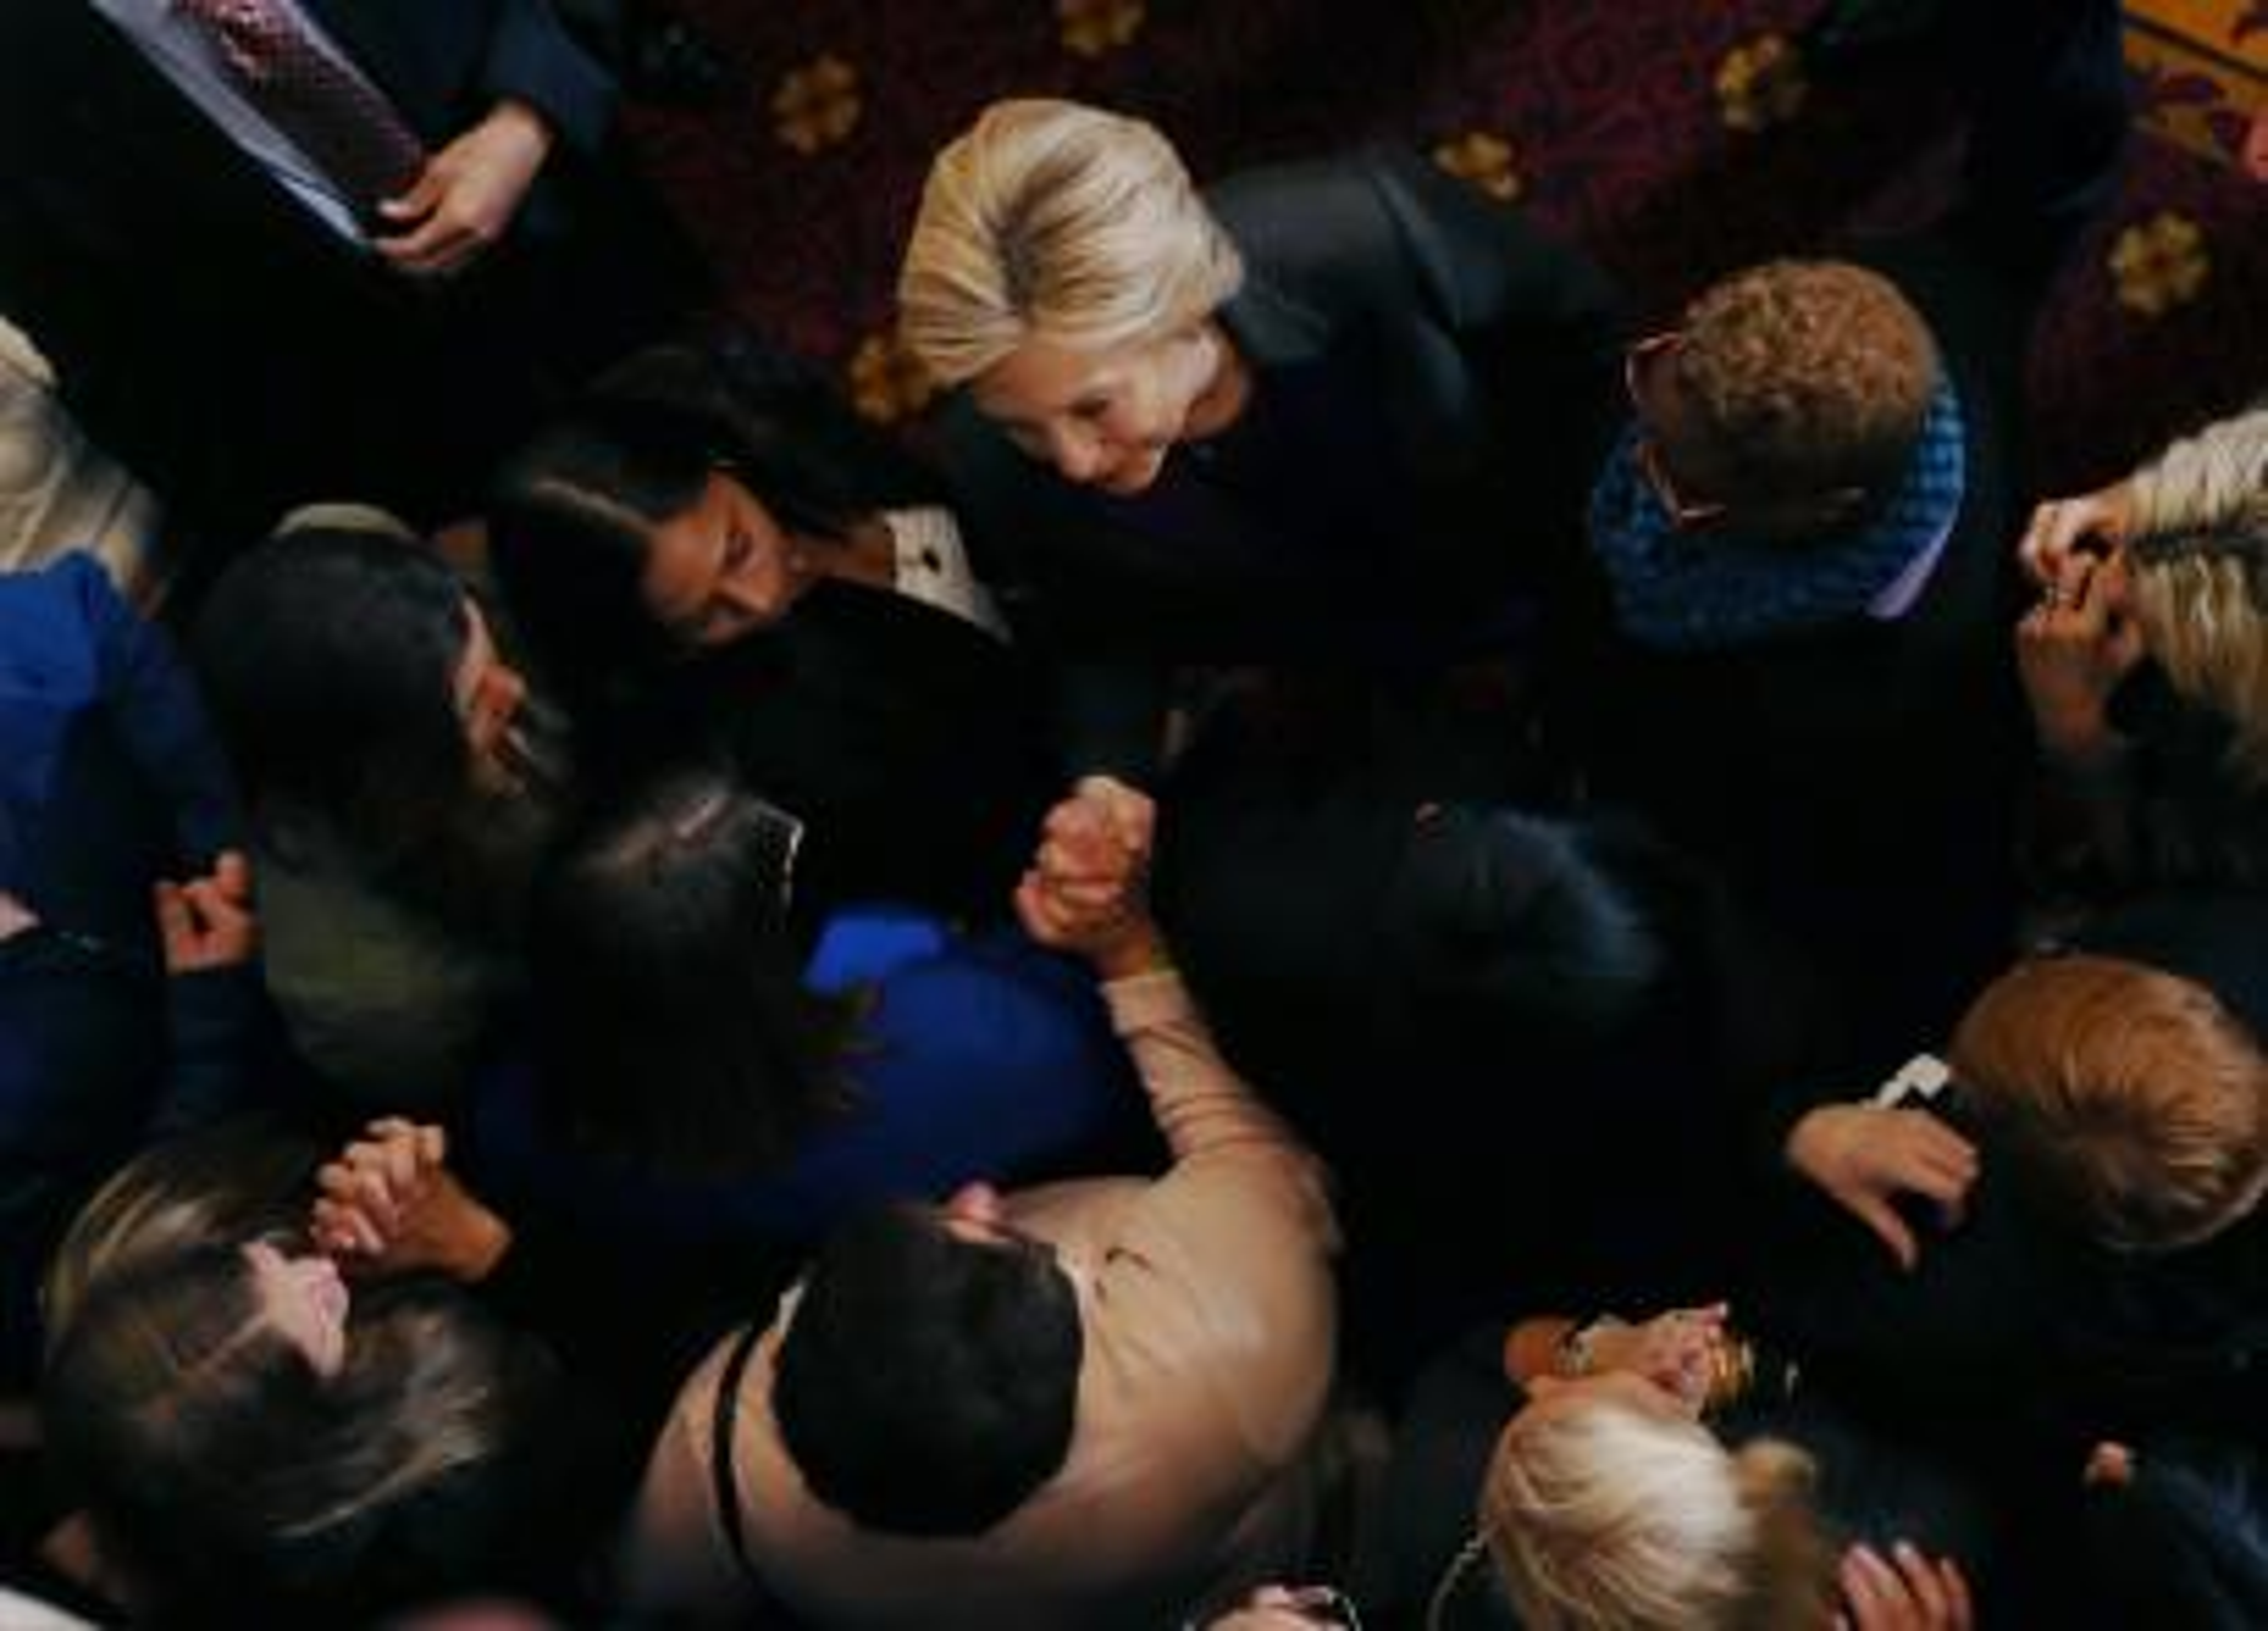 Hillary Clinton staff